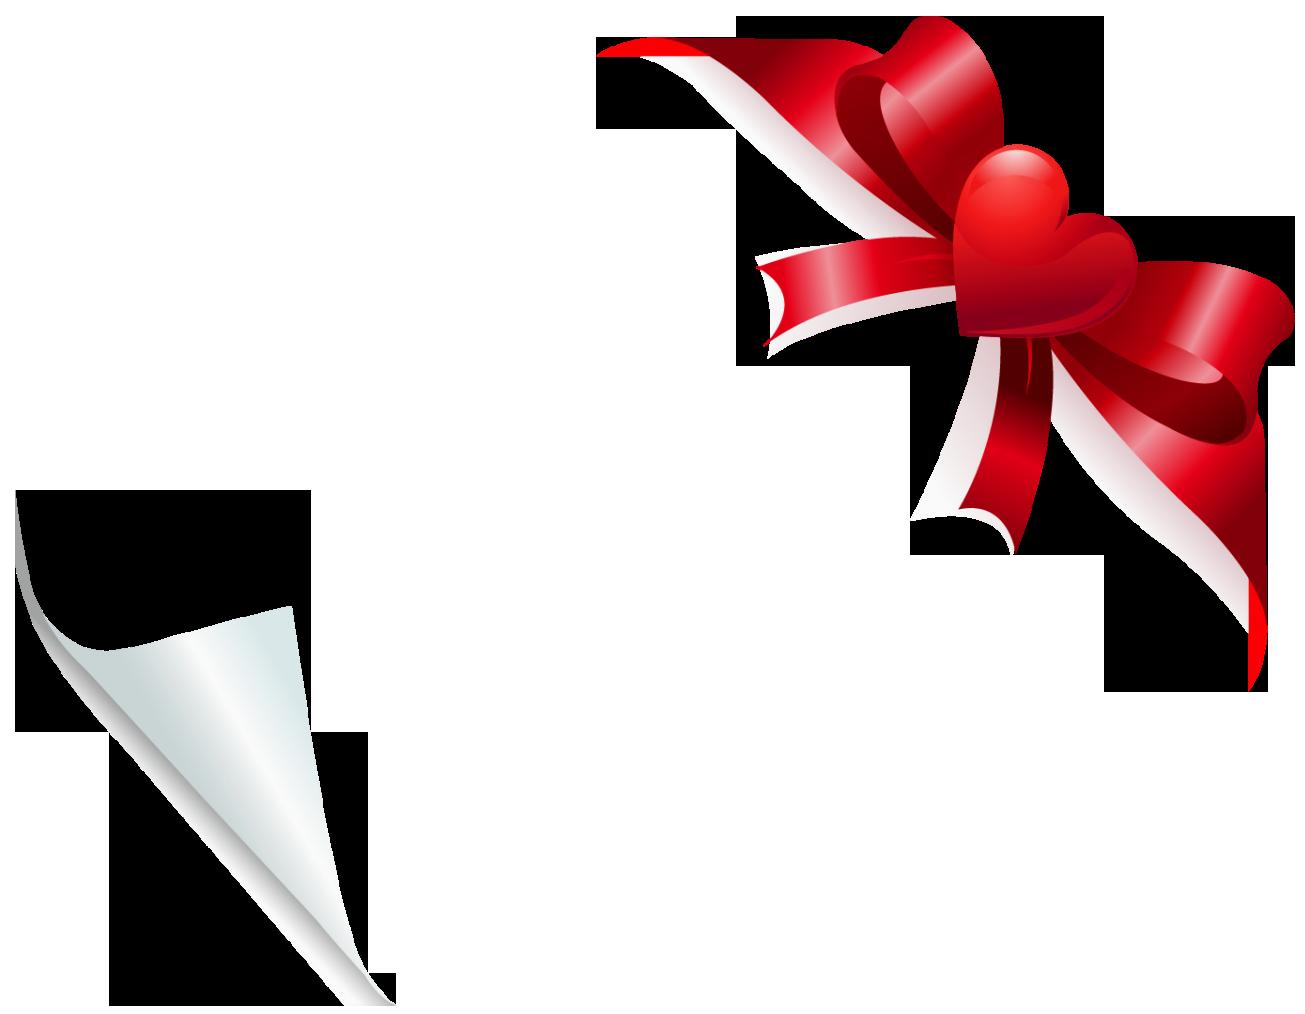 Bows clipart birthday. Valentine heart bow decoration